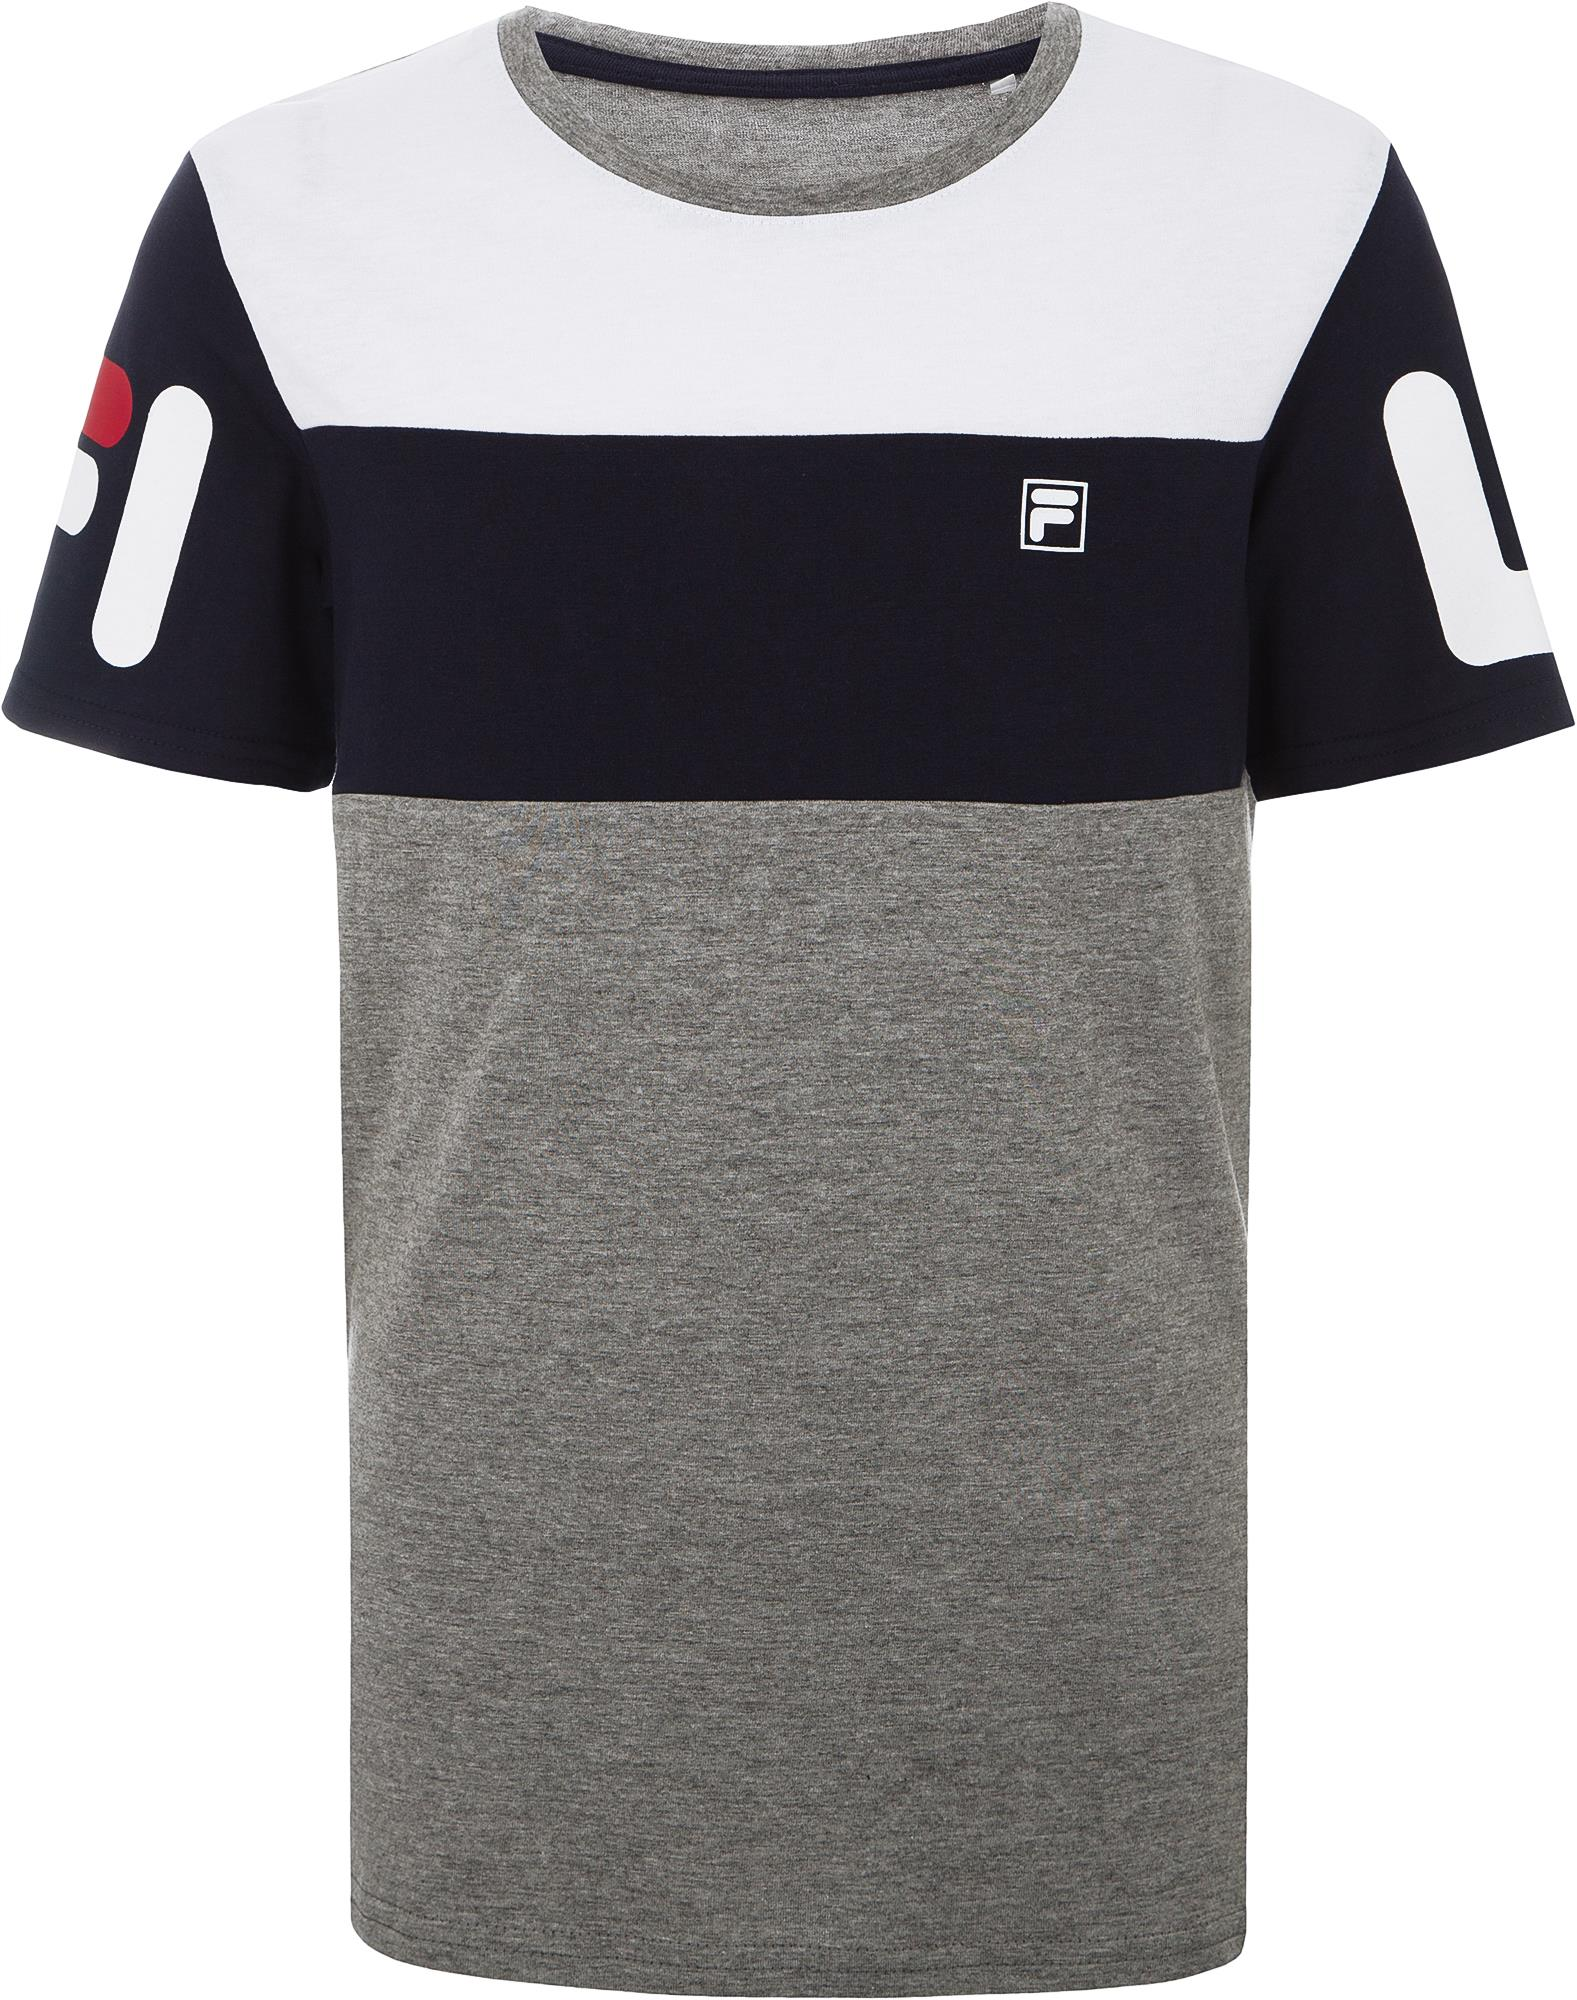 Футболка Fila Boys T-Shirt